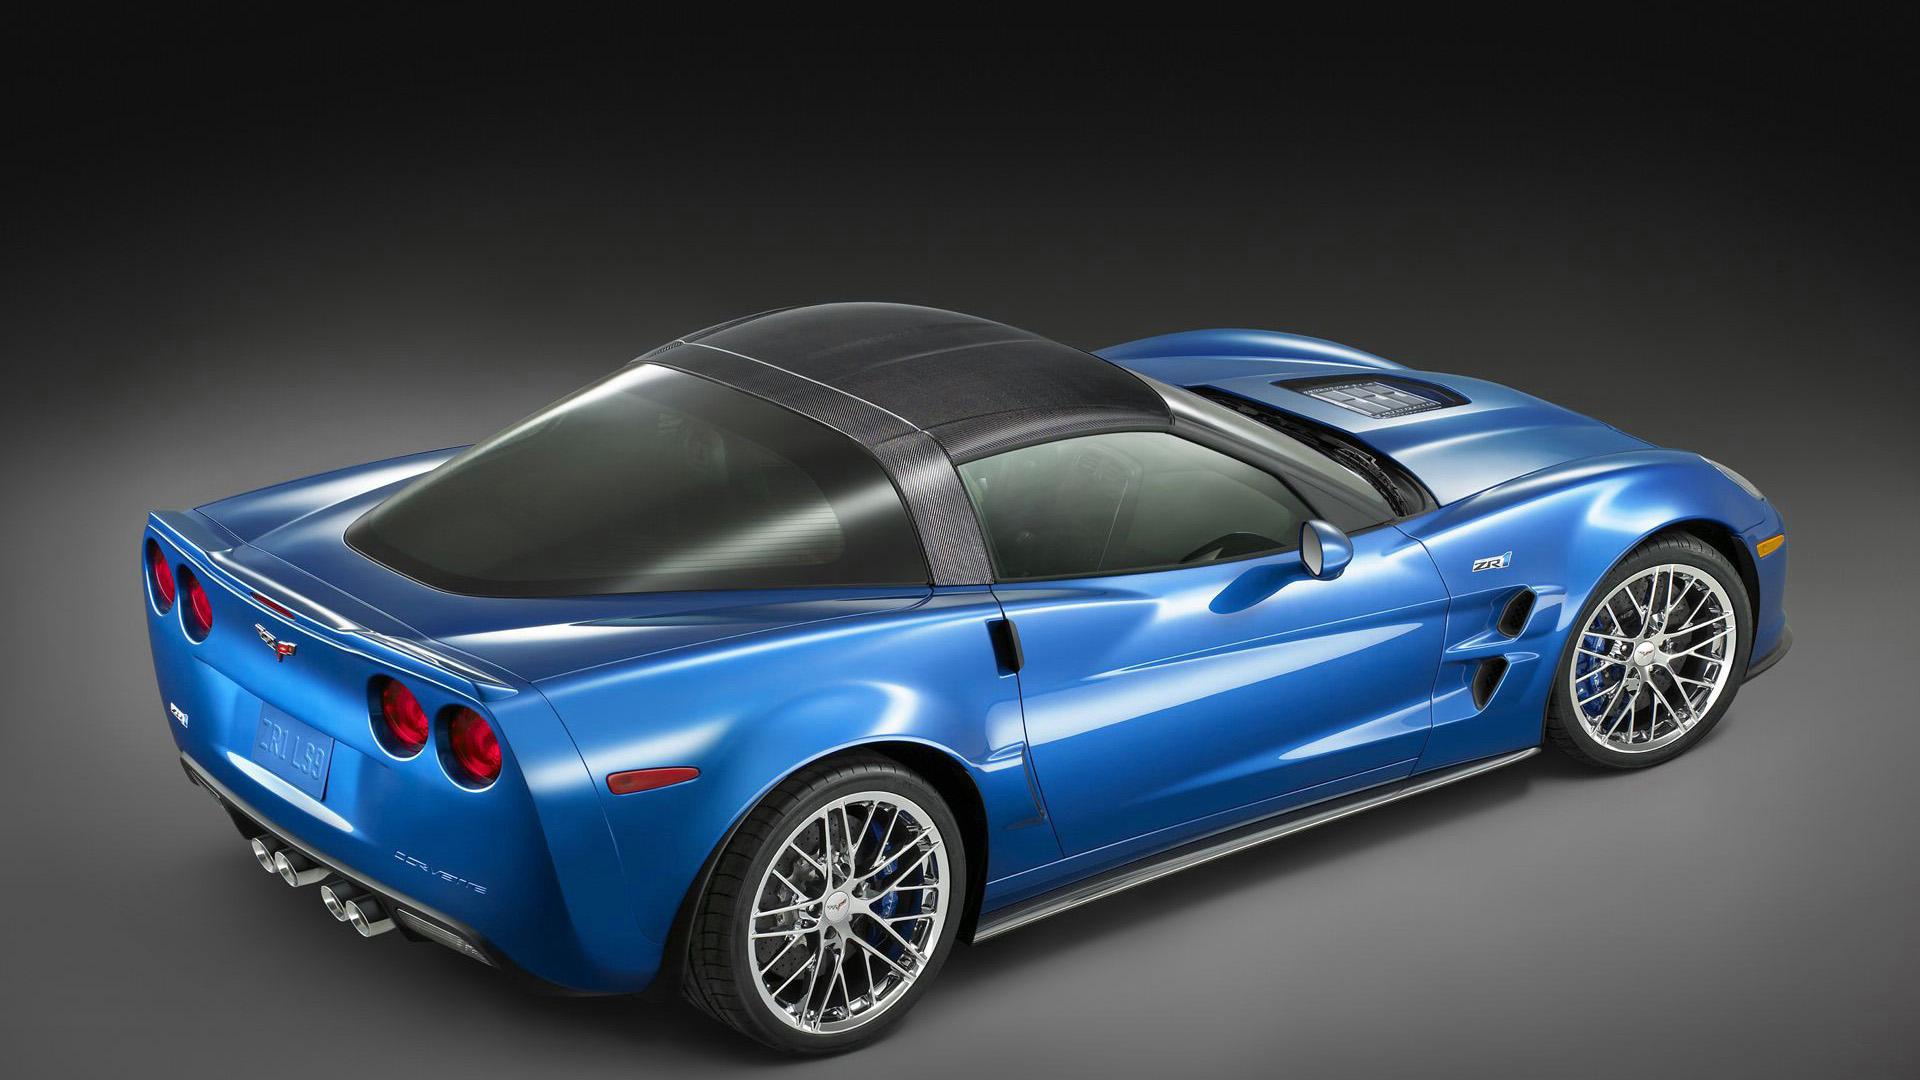 ... Corvette HD Wallpaper-1080p Free HD Resolutions | Car Wallpapers